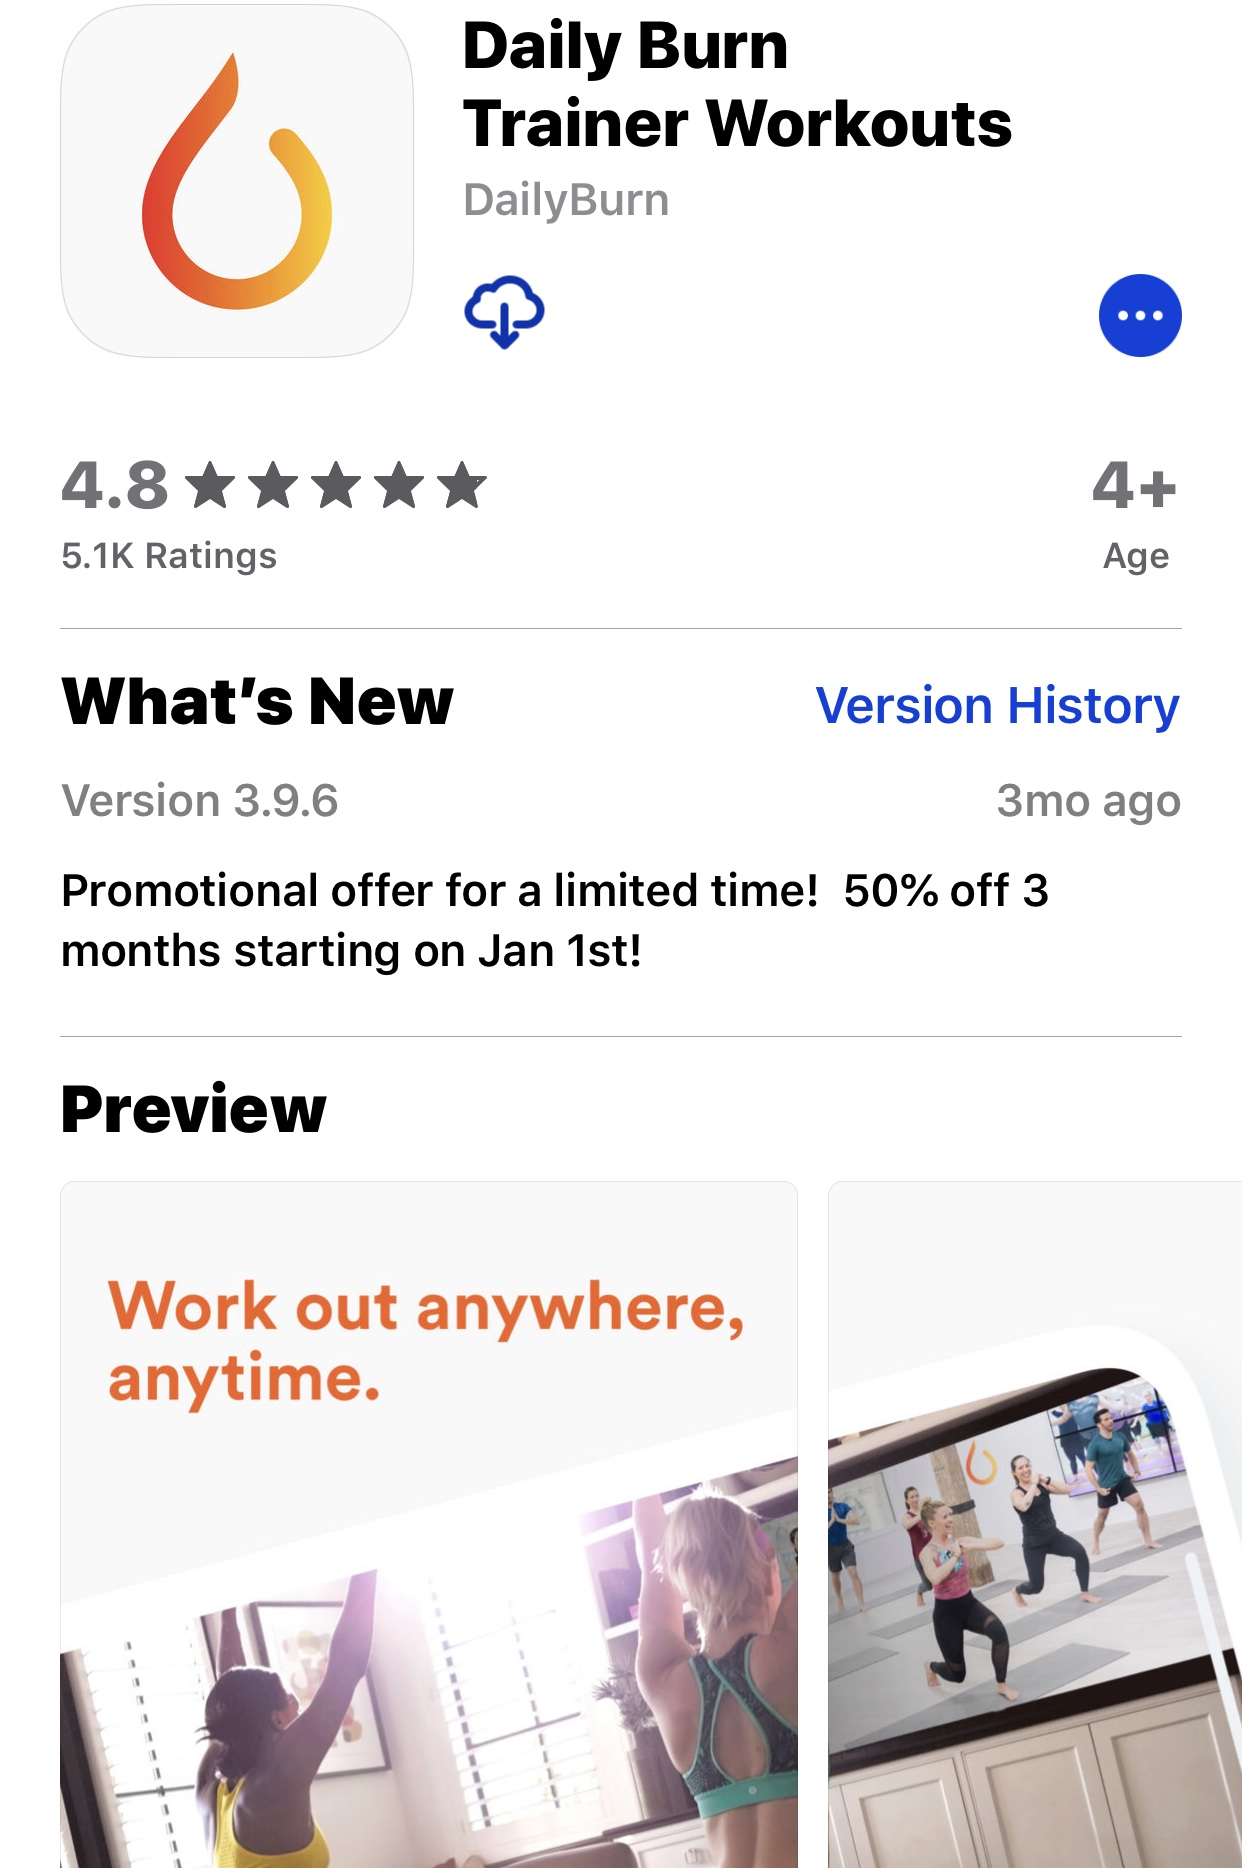 sreenshot of Daily Burn app